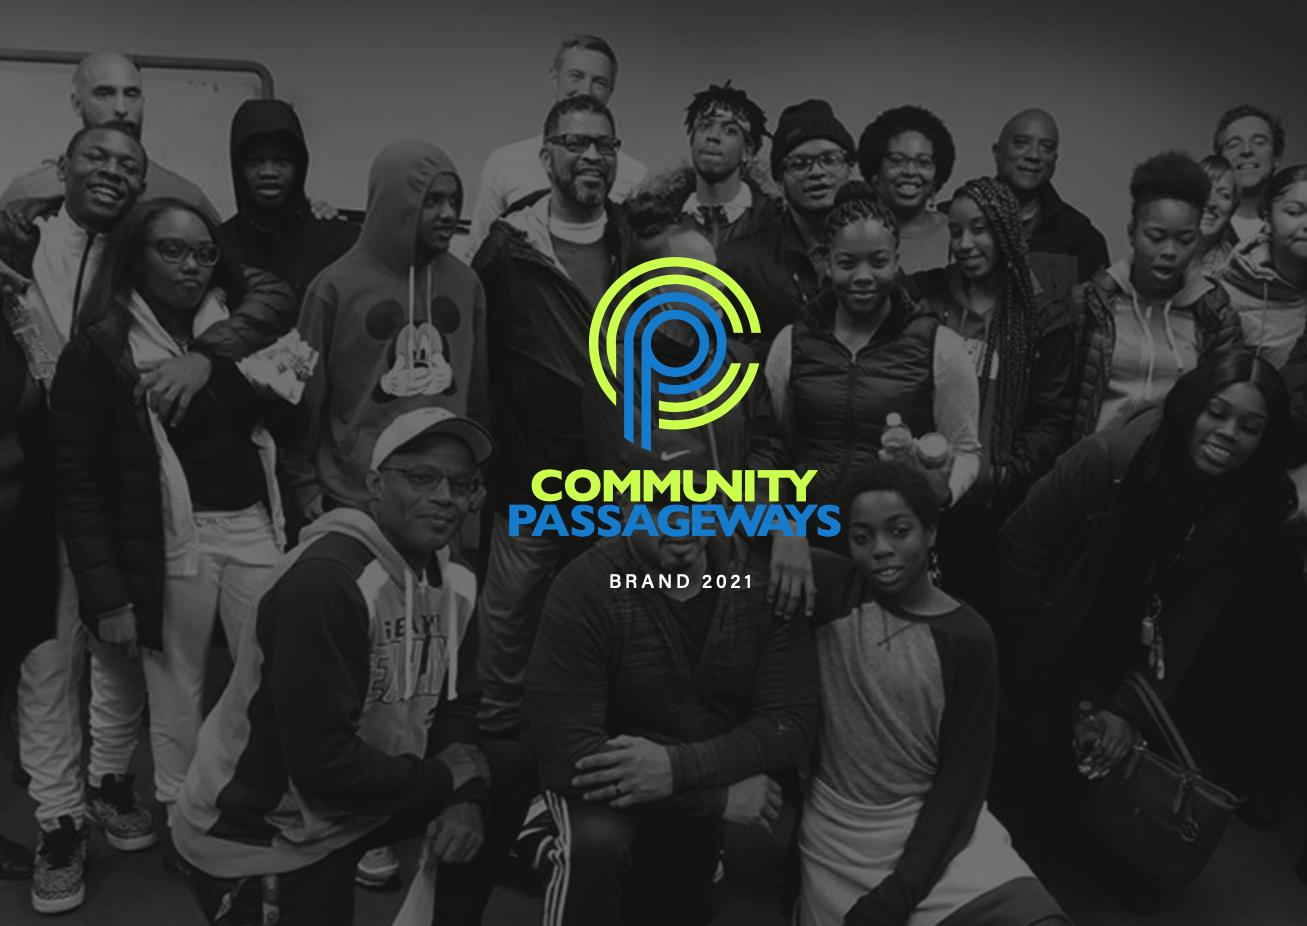 Black and white group photo overlaid with Community Passageways logo